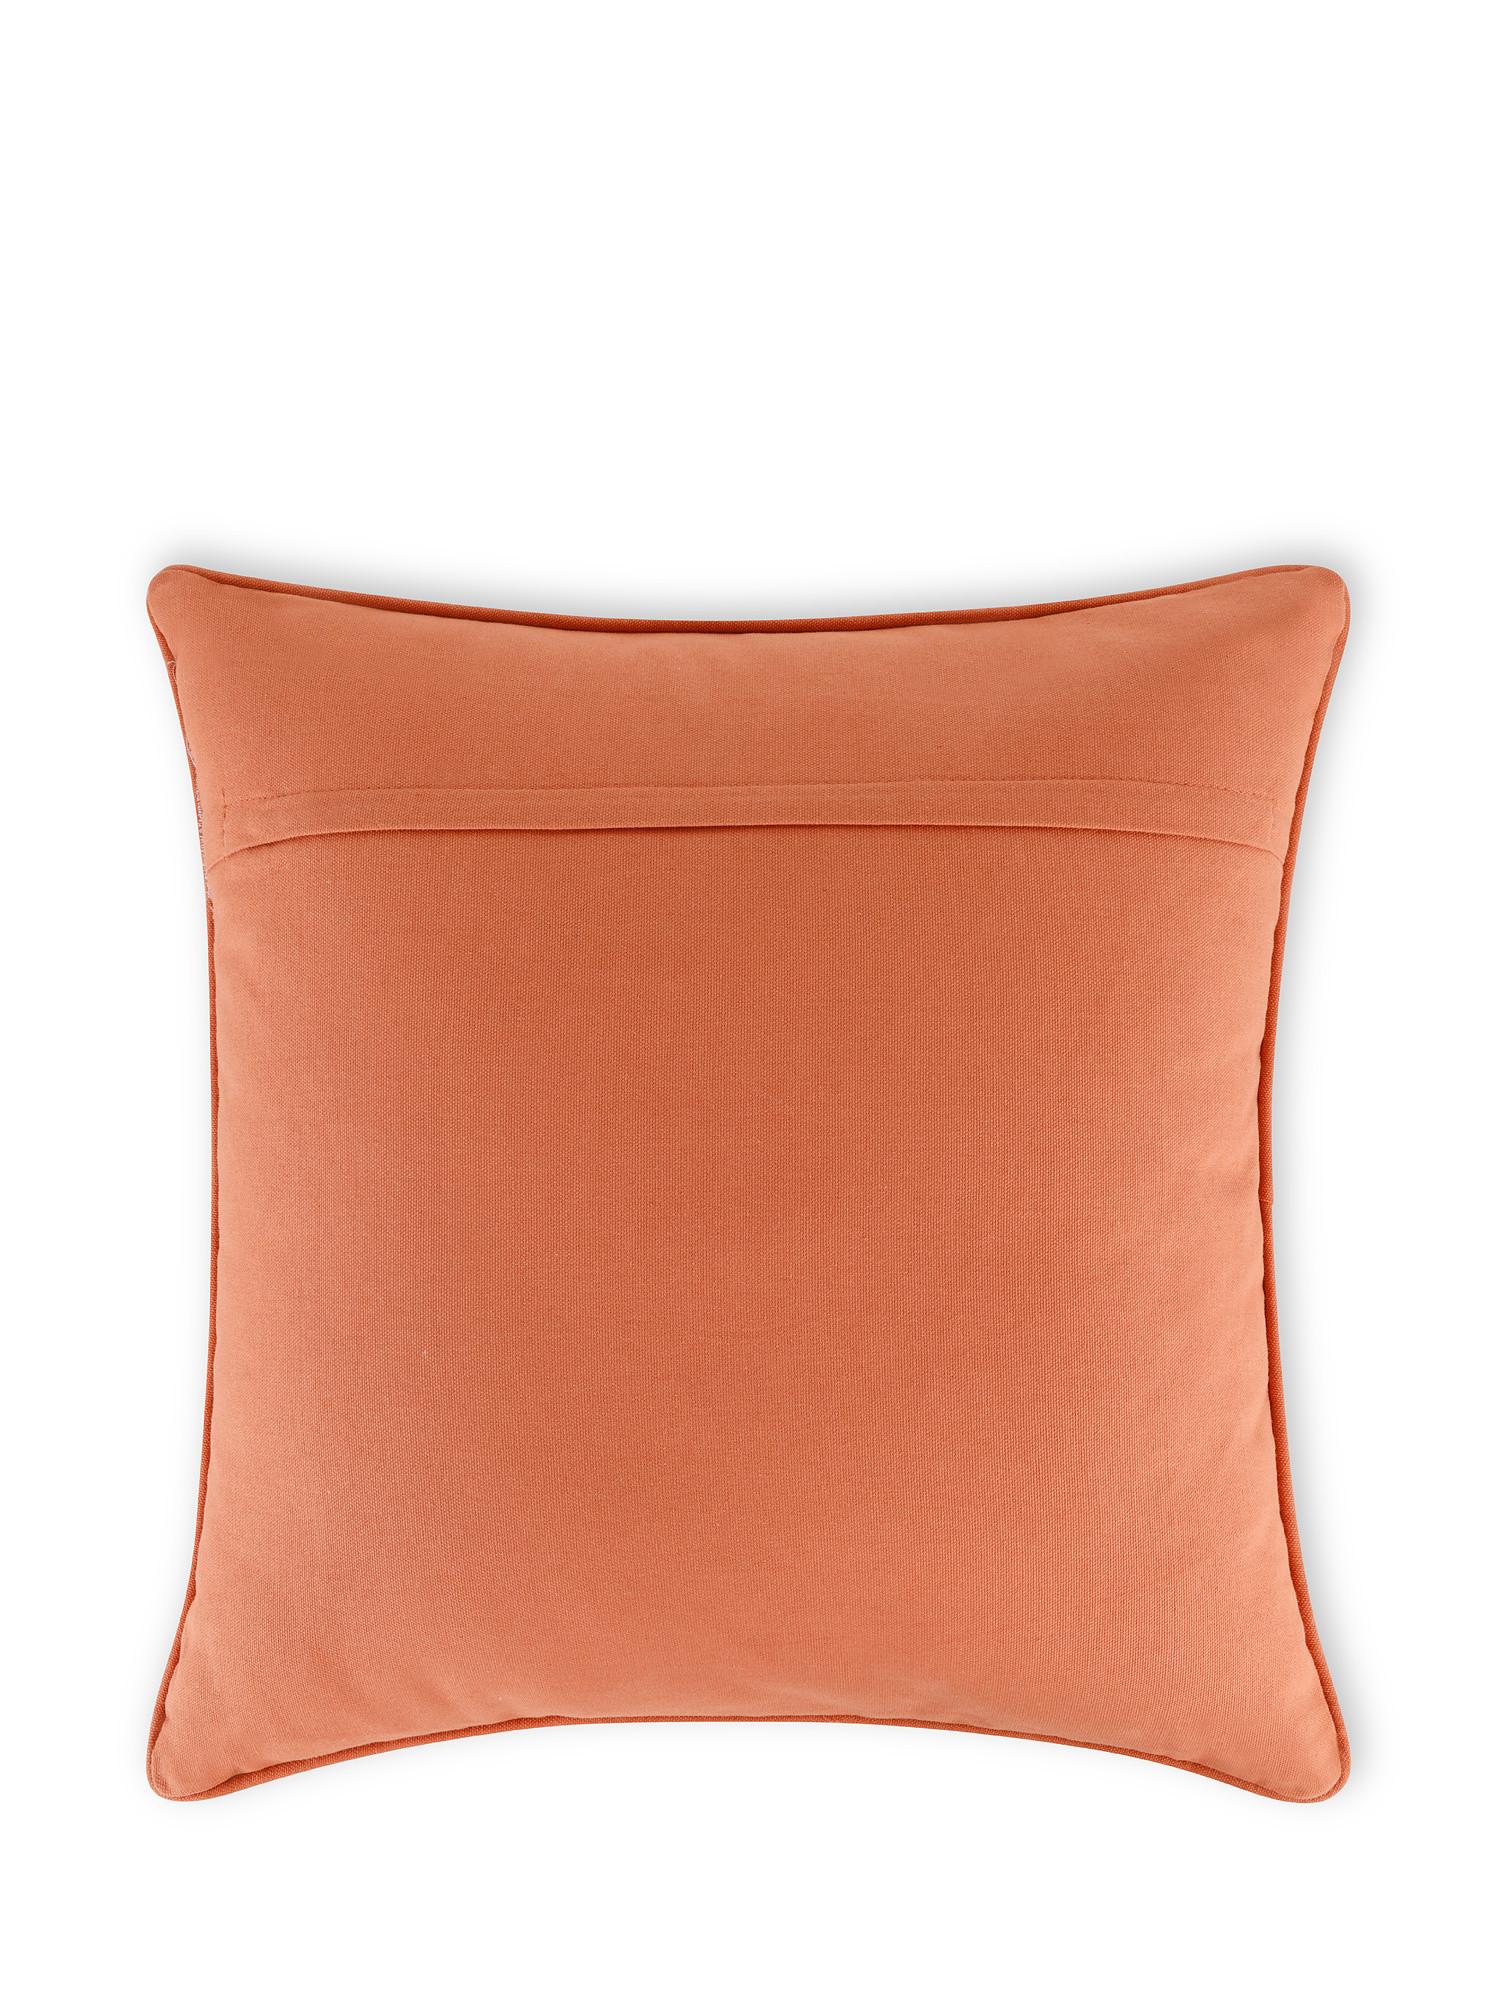 Cuscino cotone ricamo soffioni 45x45cm, Multicolor, large image number 1